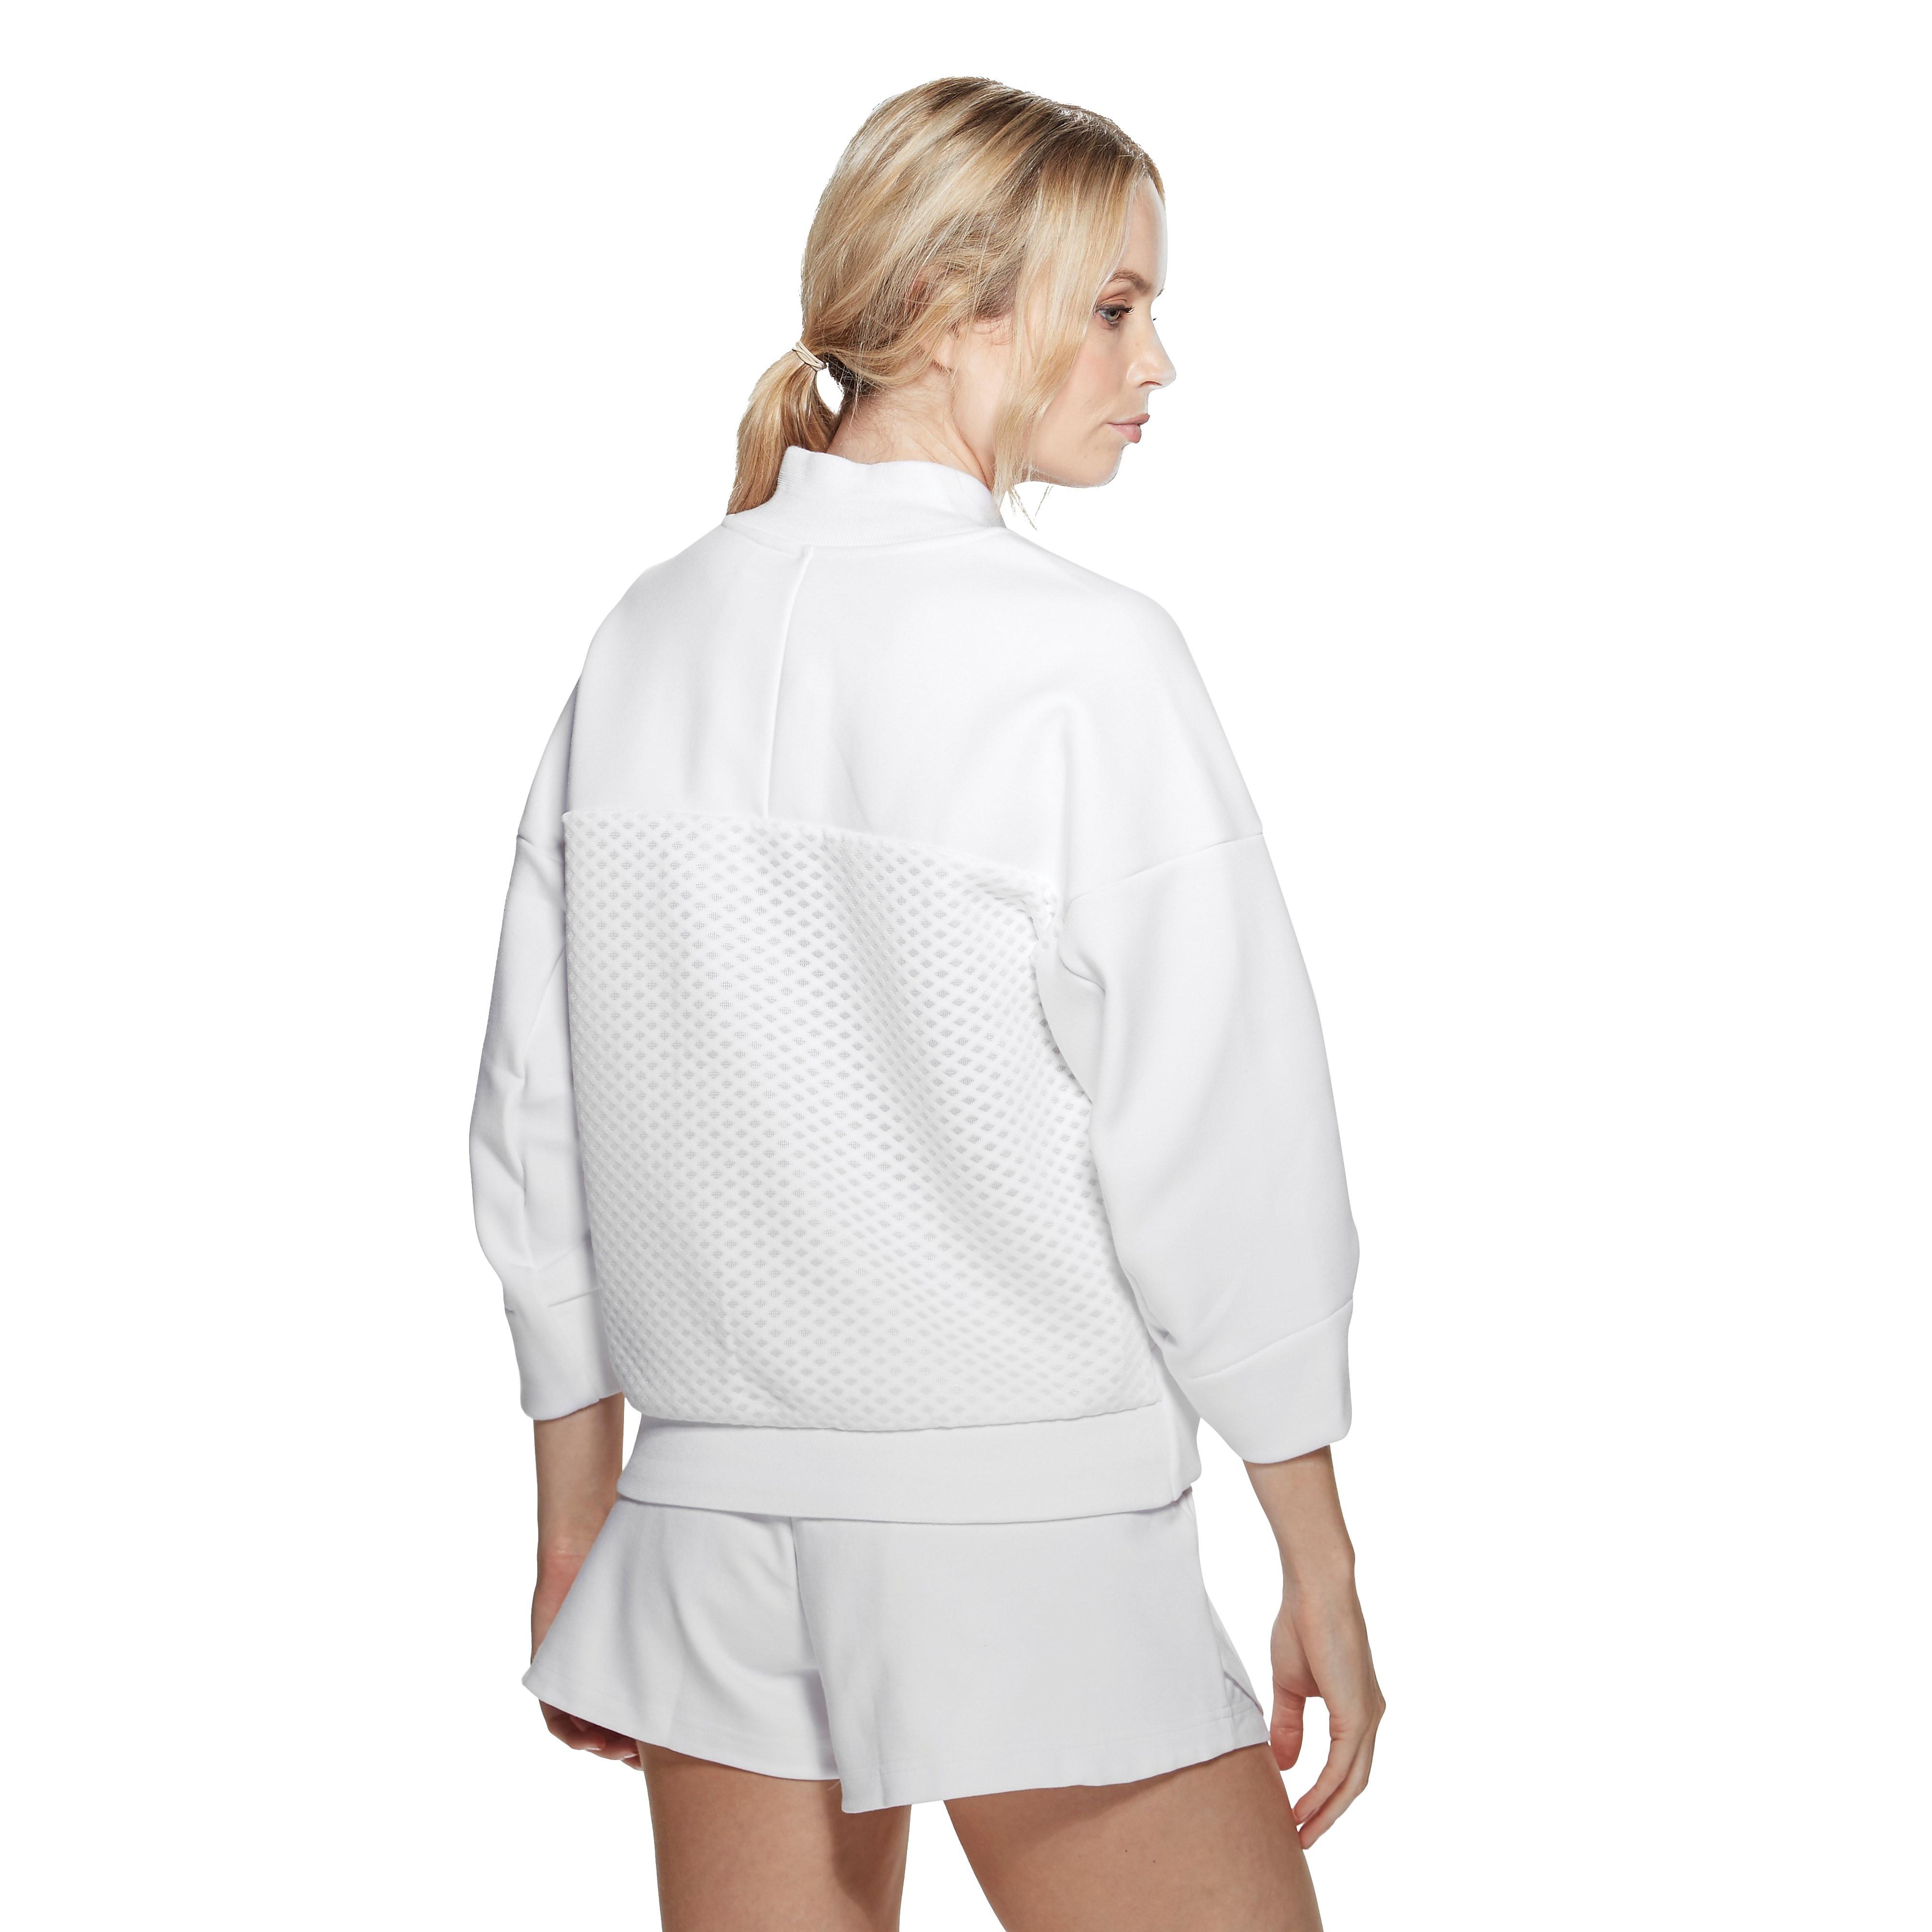 adidas Z.N.E. Modern Bomber Women's Jacket